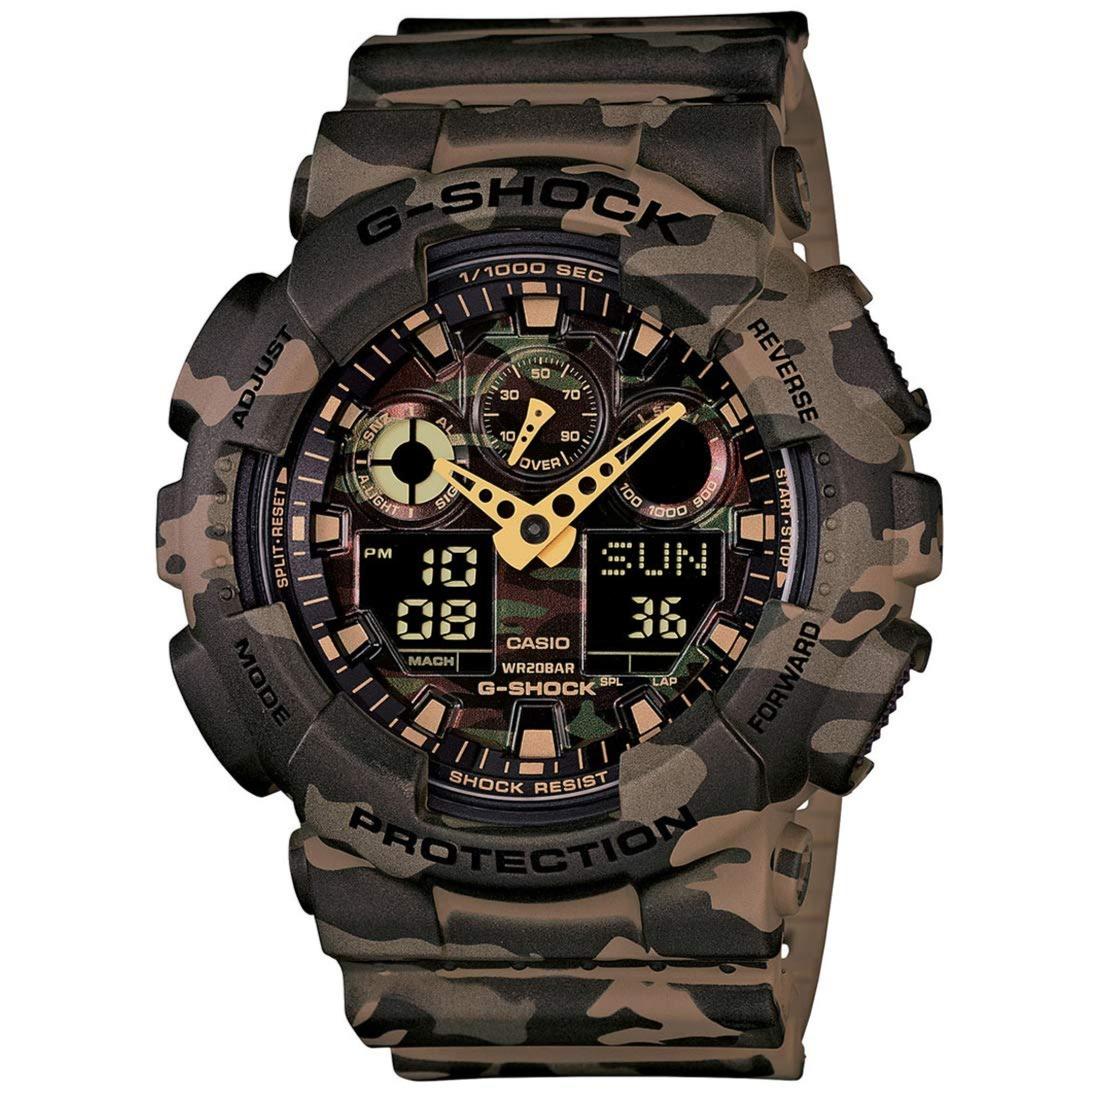 Buy Casio G-Shock Analog-Digital Green Dial Men's Watch - GA-100CM-5ADR (G580) at Amazon.in